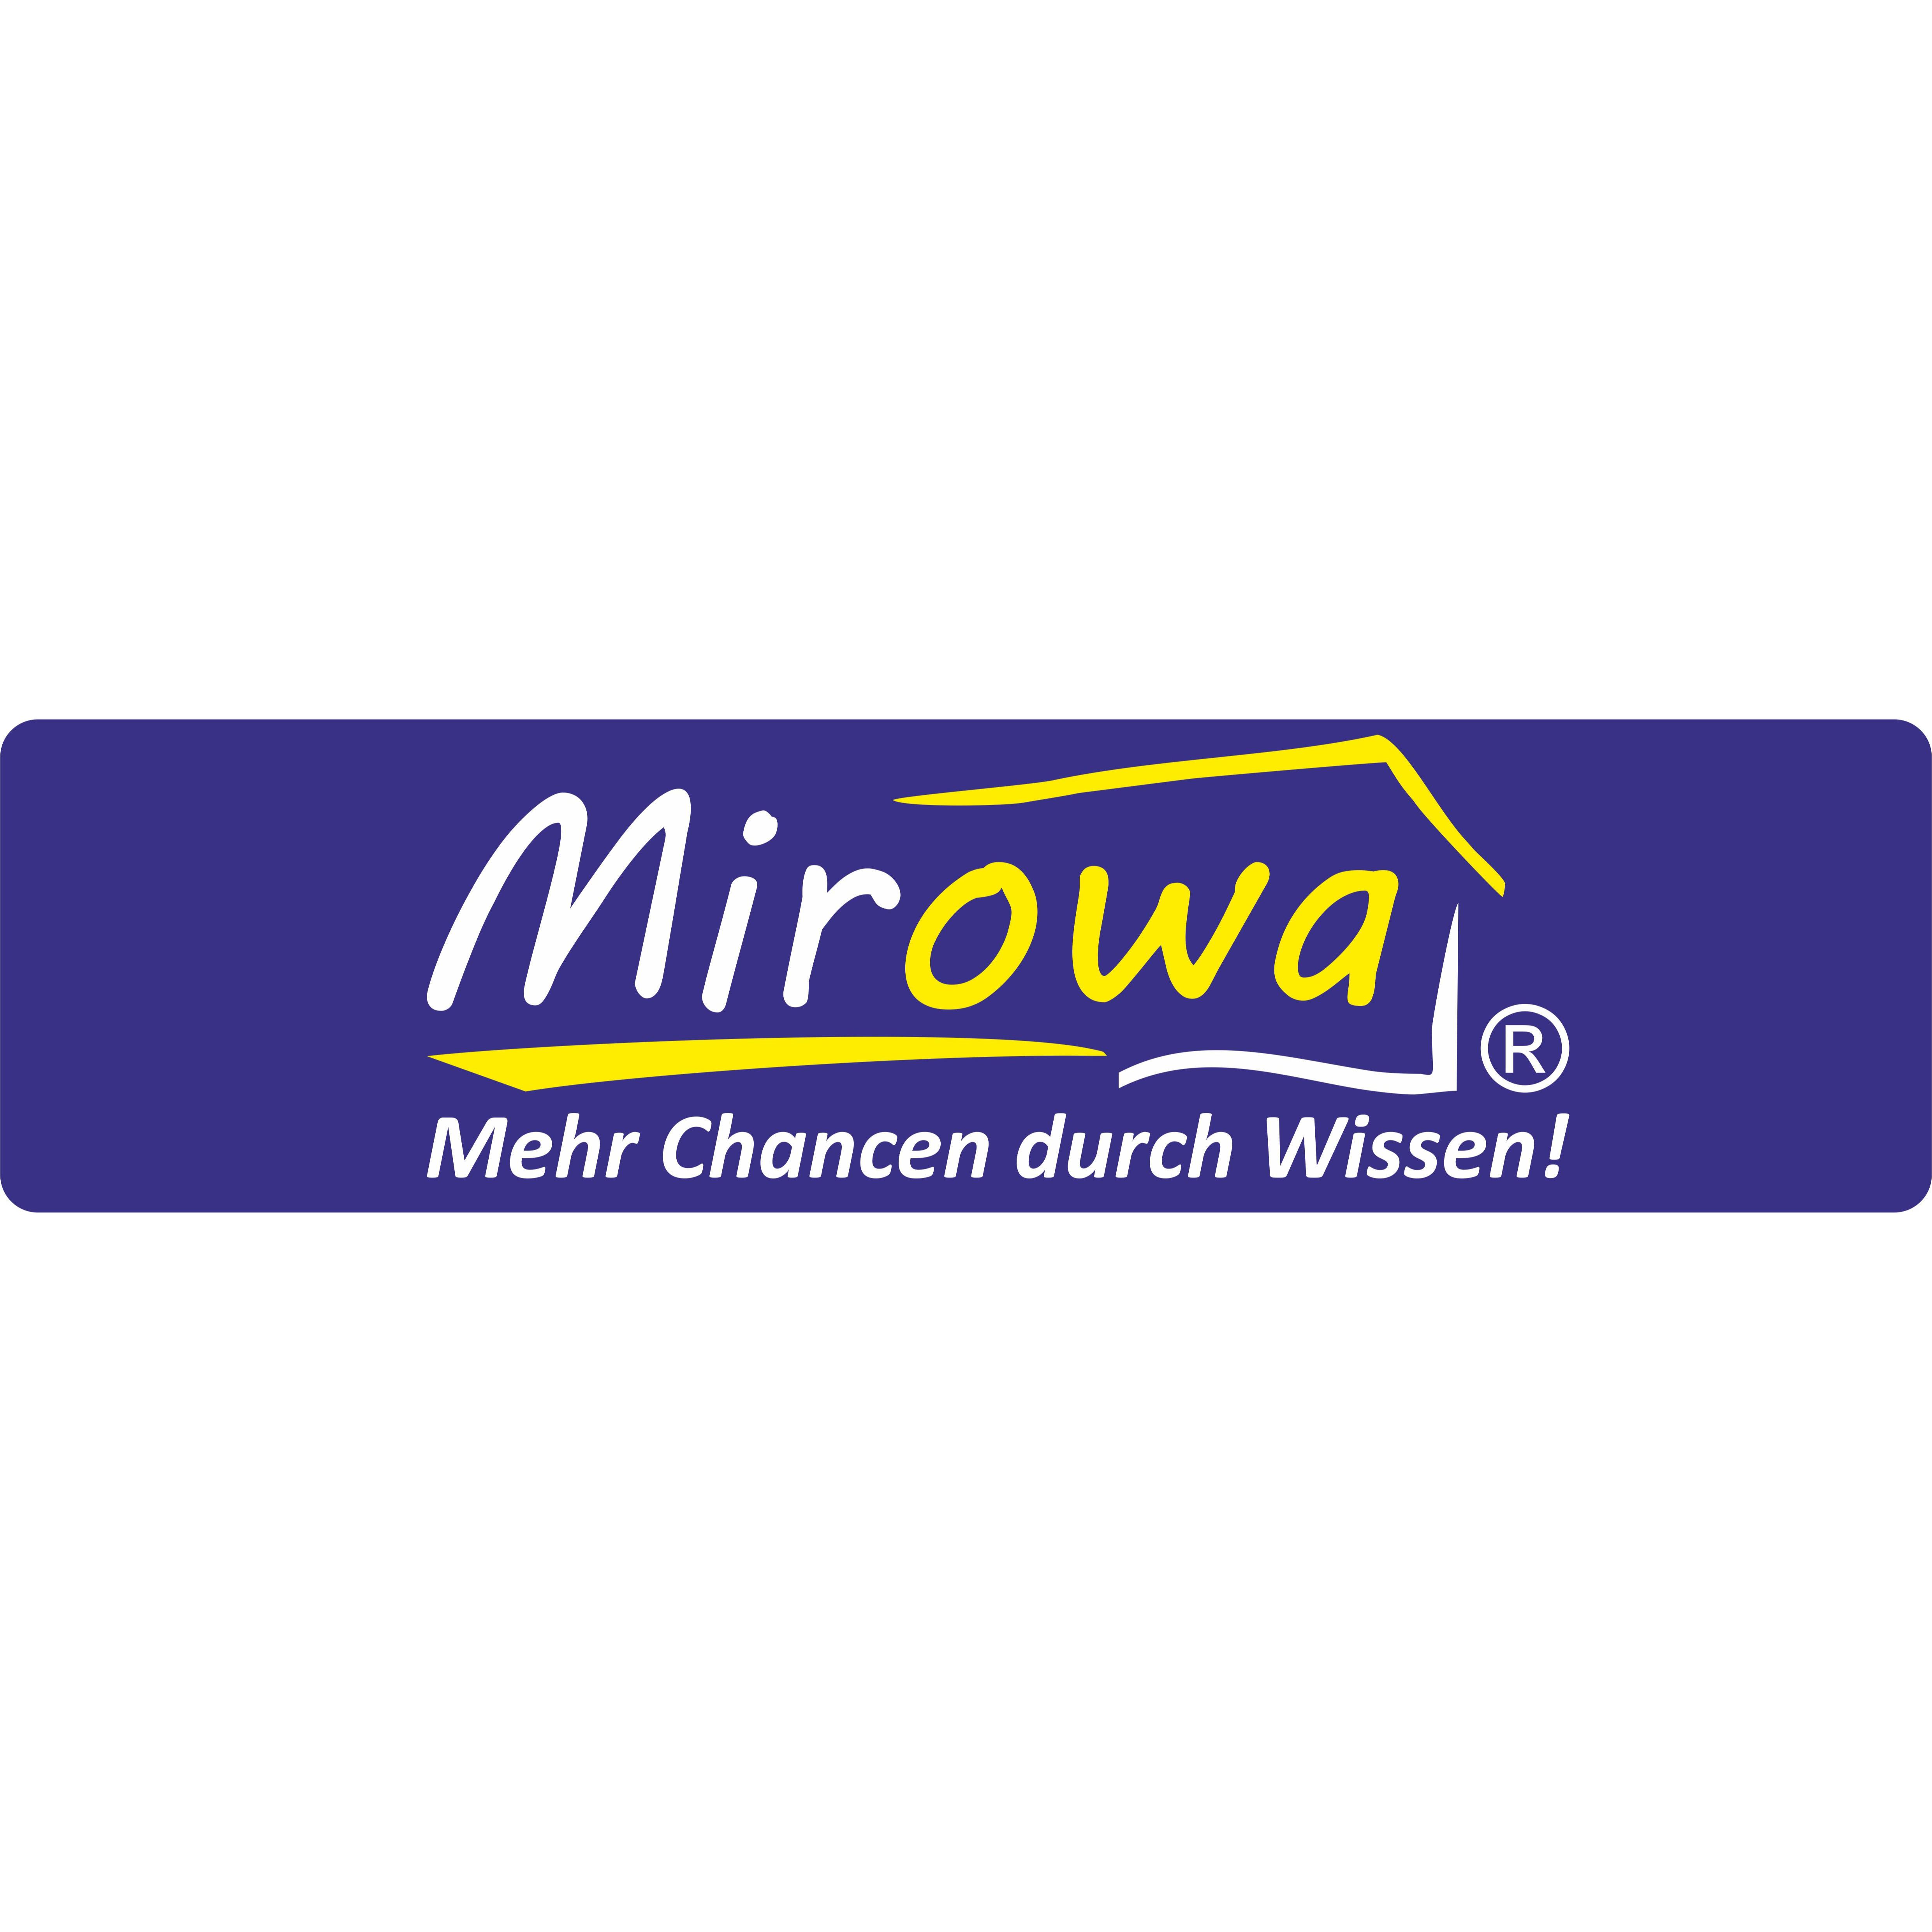 Bild zu Mirowa Nachhilfe-plus, Inh. Tobias Rode in Bochum